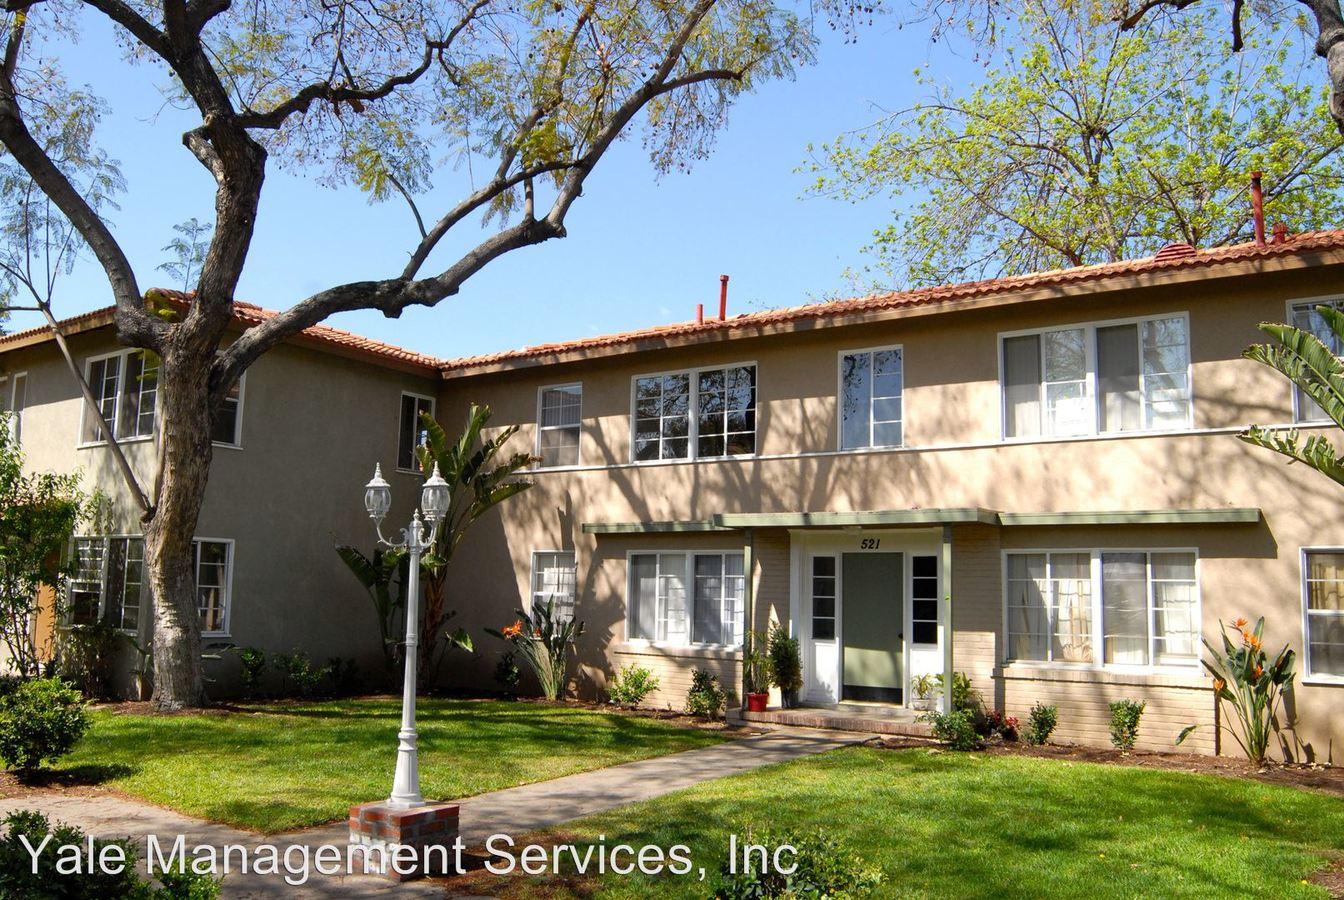 1 Bedroom 1 Bathroom Apartment for rent at 645 W Pomona Blvd in Monterey Park, CA